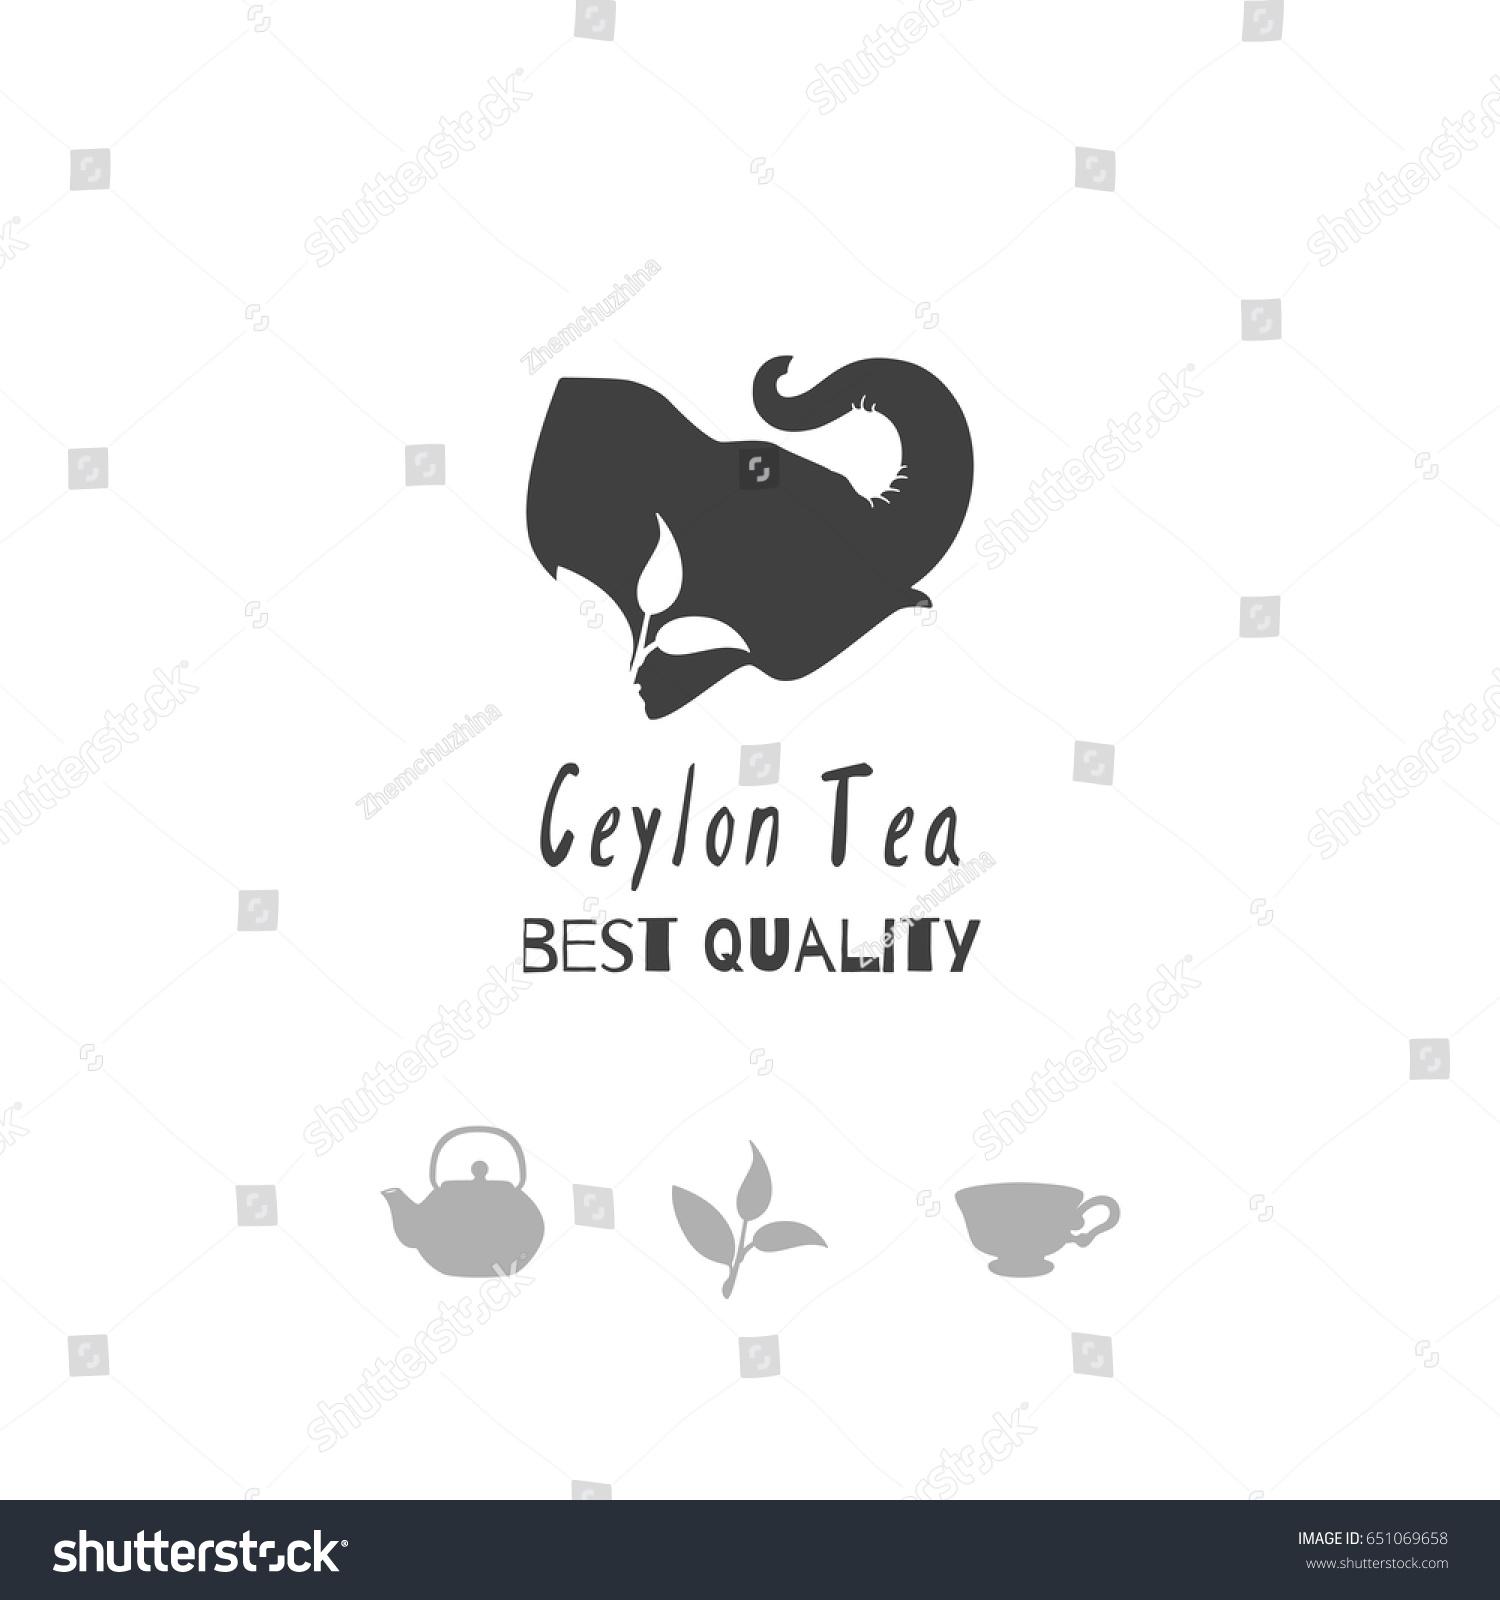 Set Hand Drawn Silhouettes Elephant Teapot Stock Vector 651069658 ...